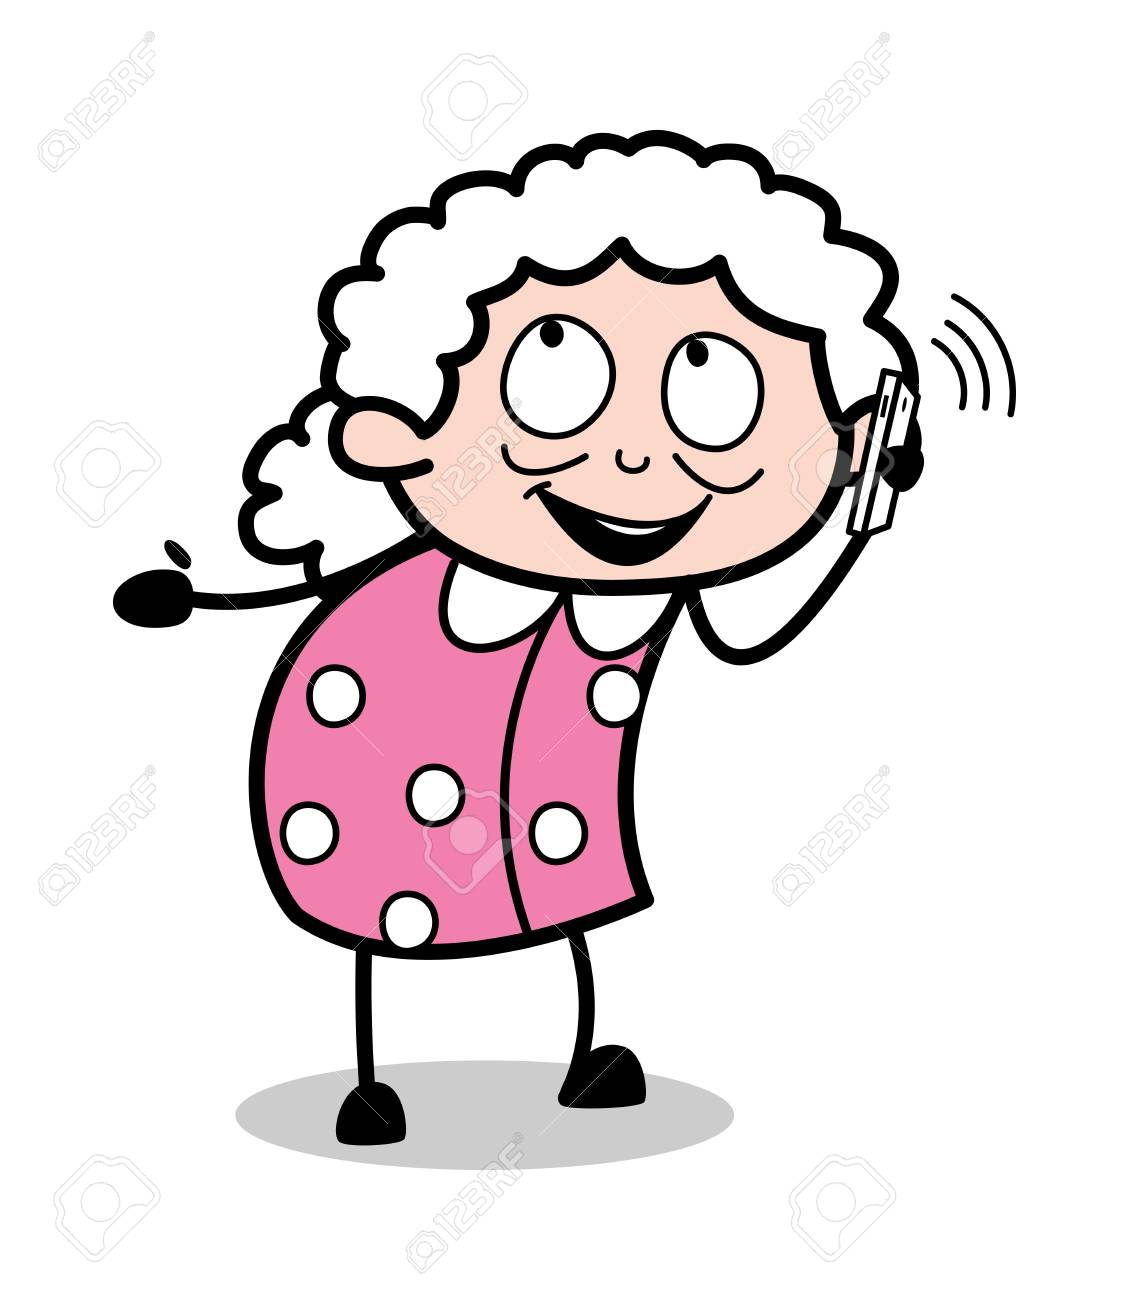 Talking On Phone - Old Cartoon Granny Vector Illustration Royalty ...